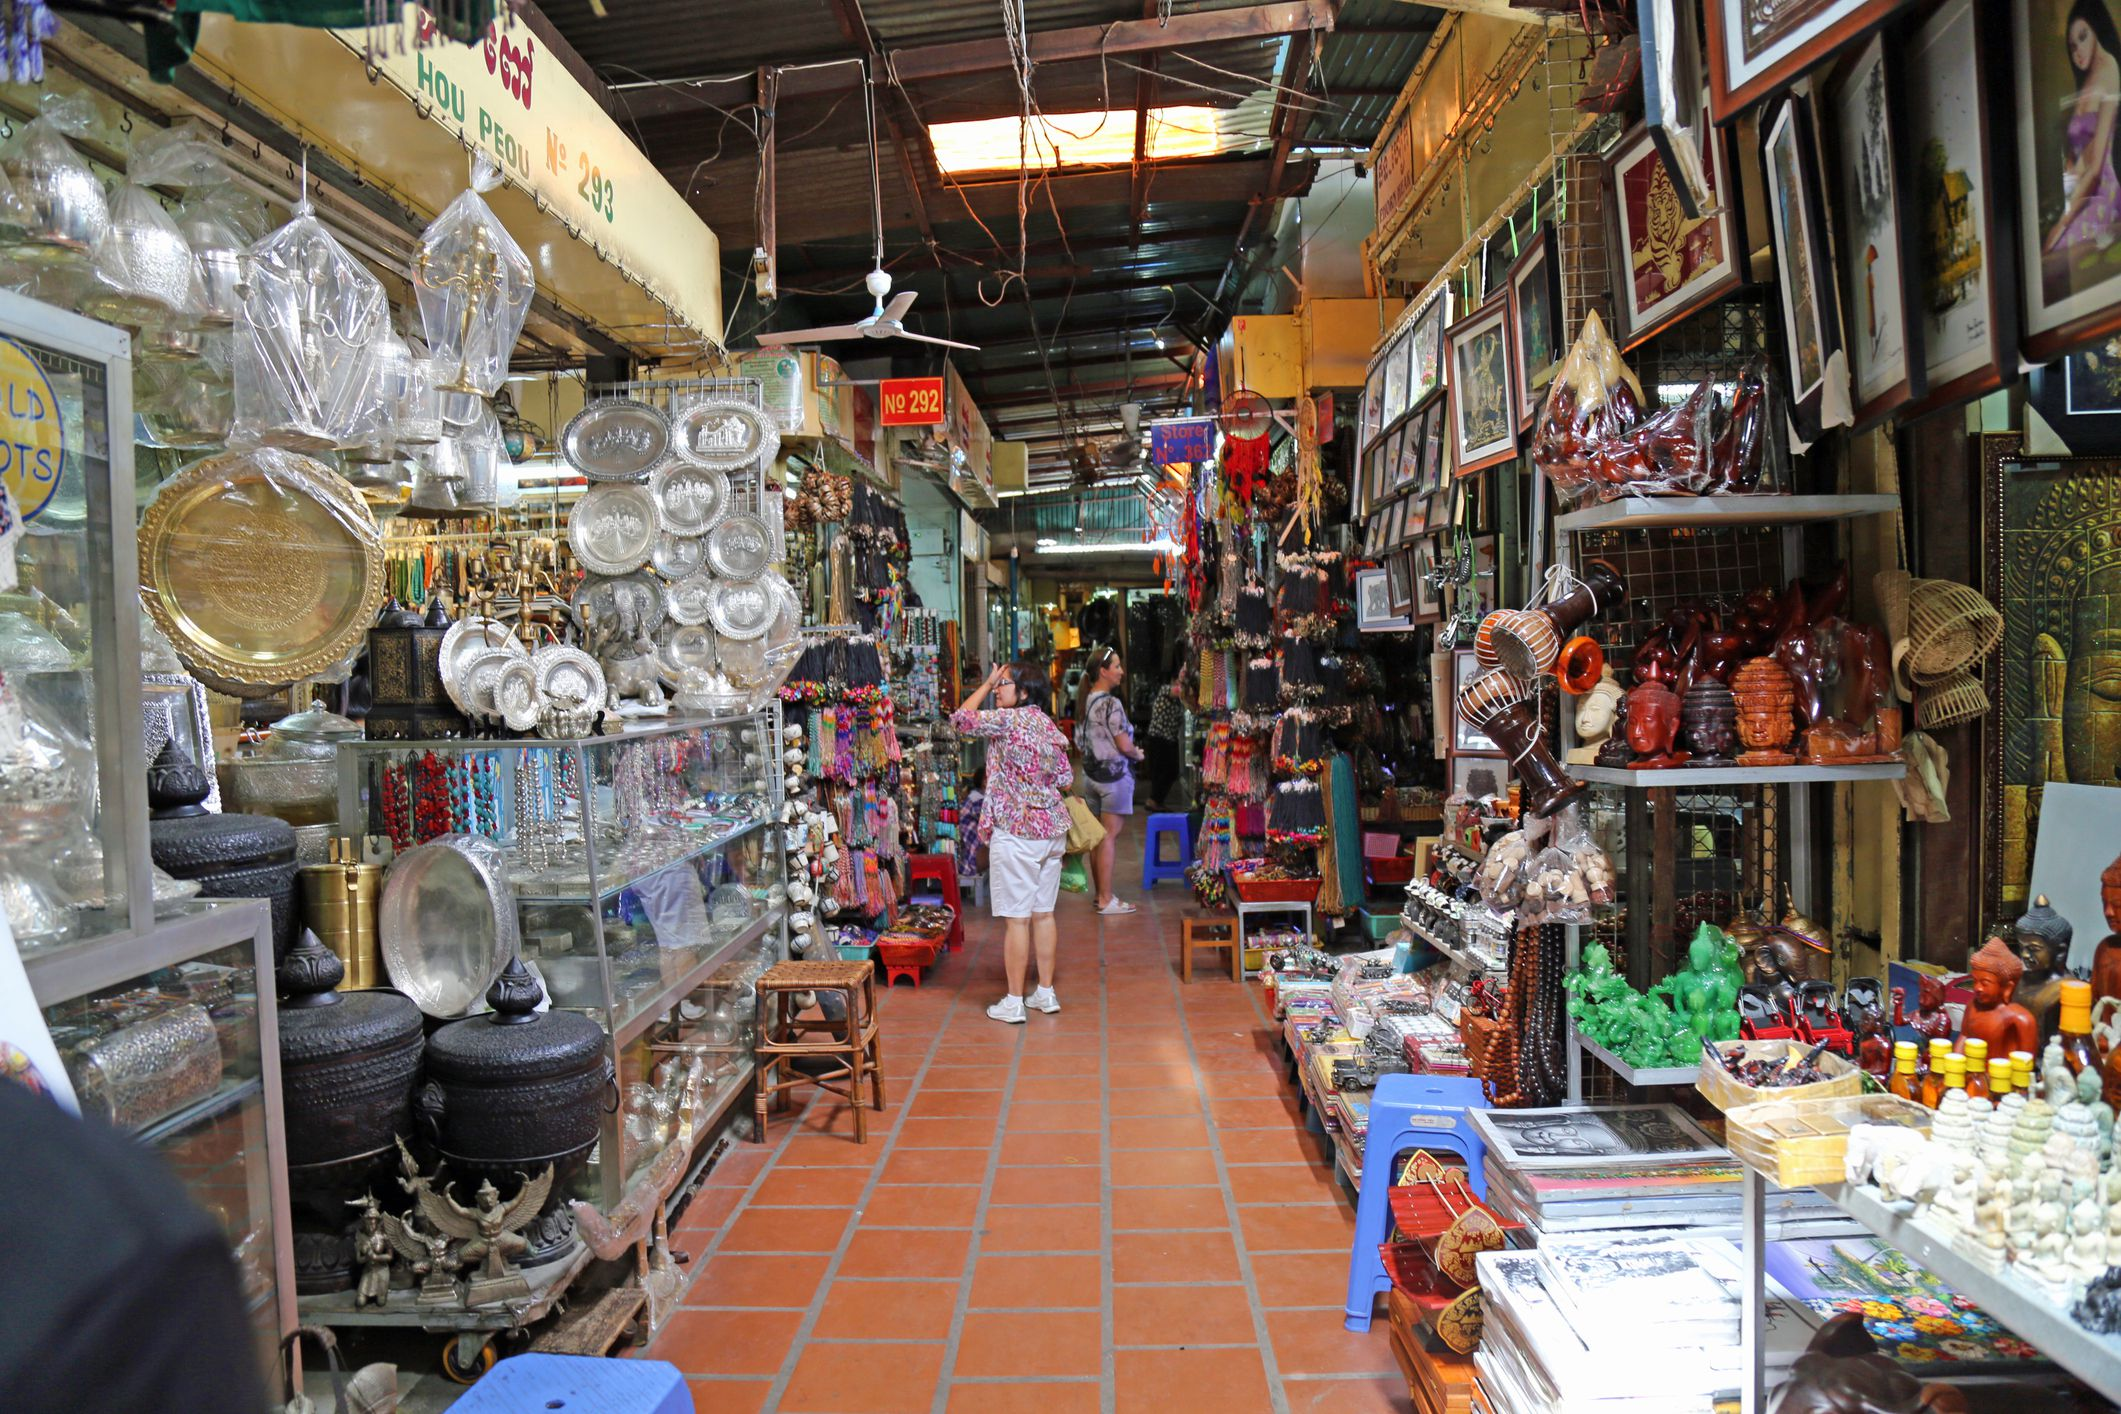 Interior of Russian Market, Phnom Penh, Cambodia